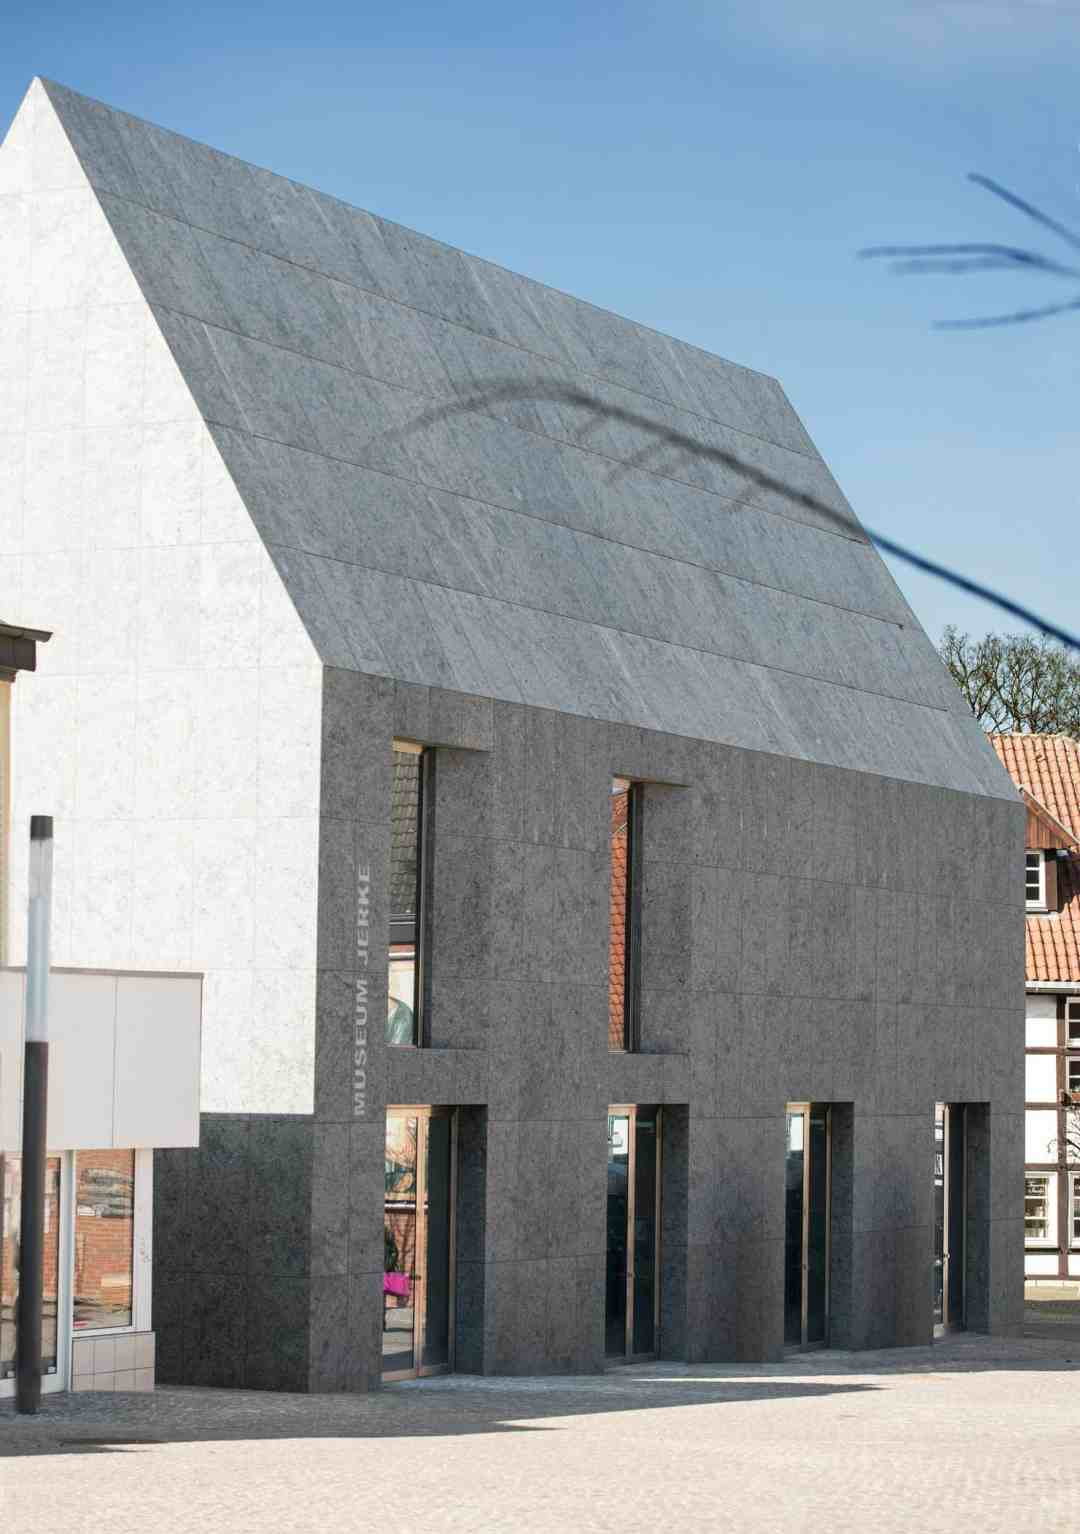 the Jerke Museum in Recklinghausen